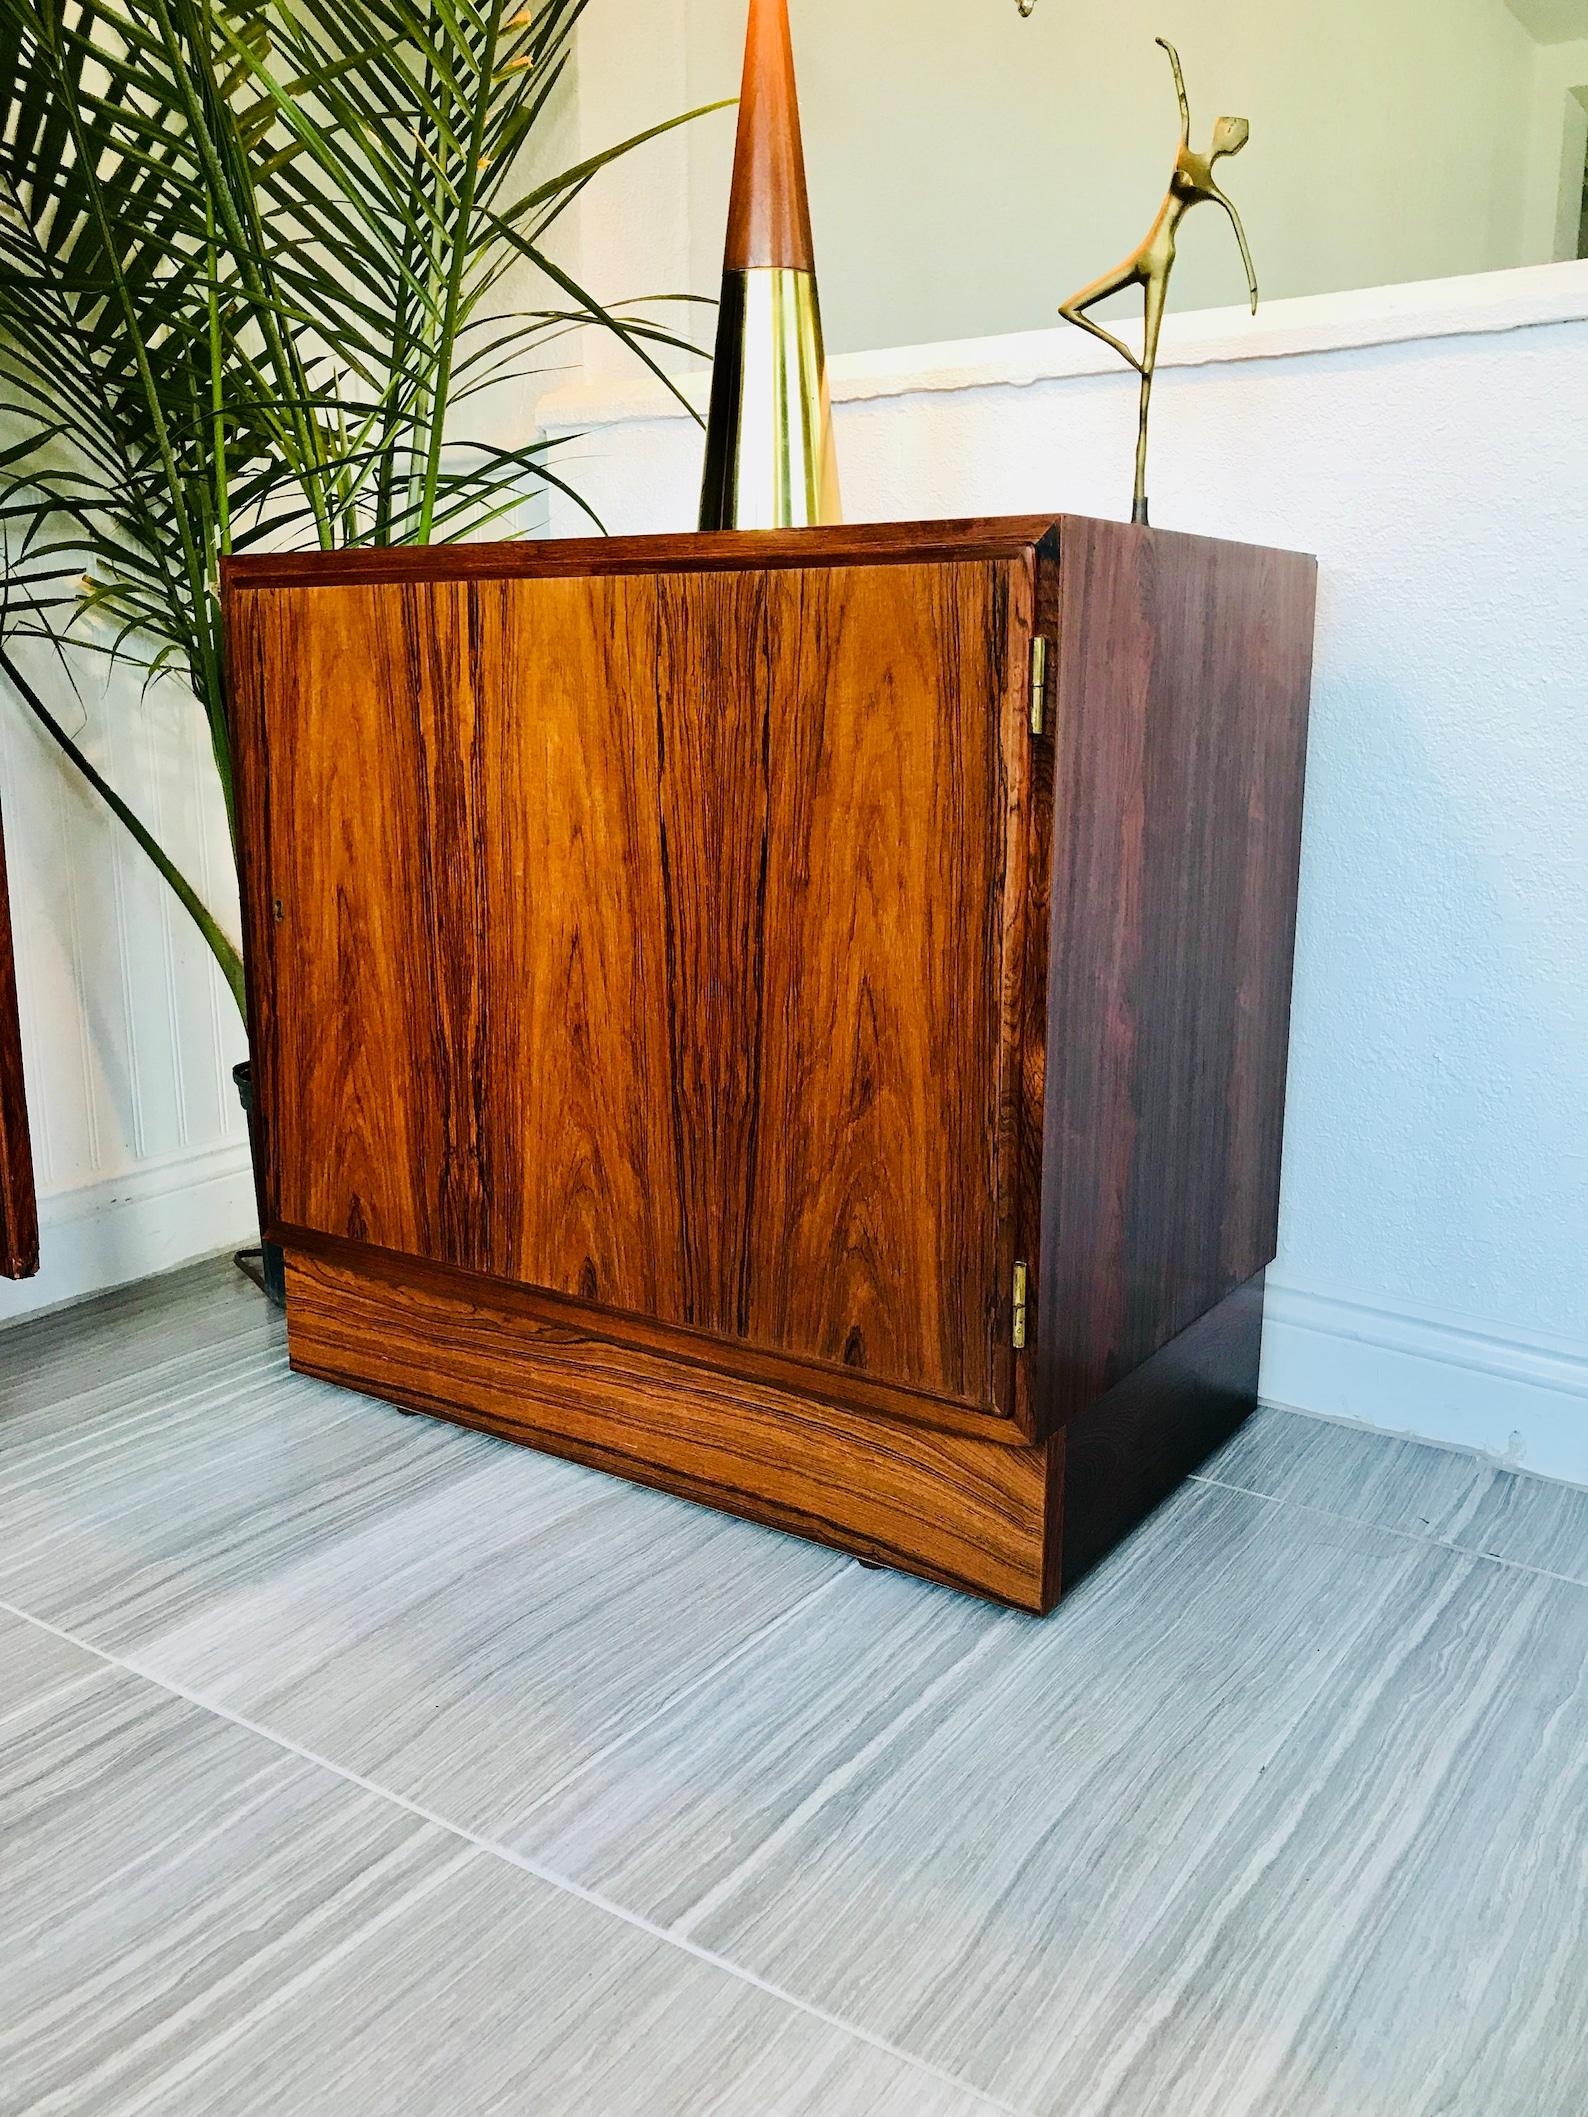 Picture of: Mid Century Bar Cabinets Bar Scene Decor